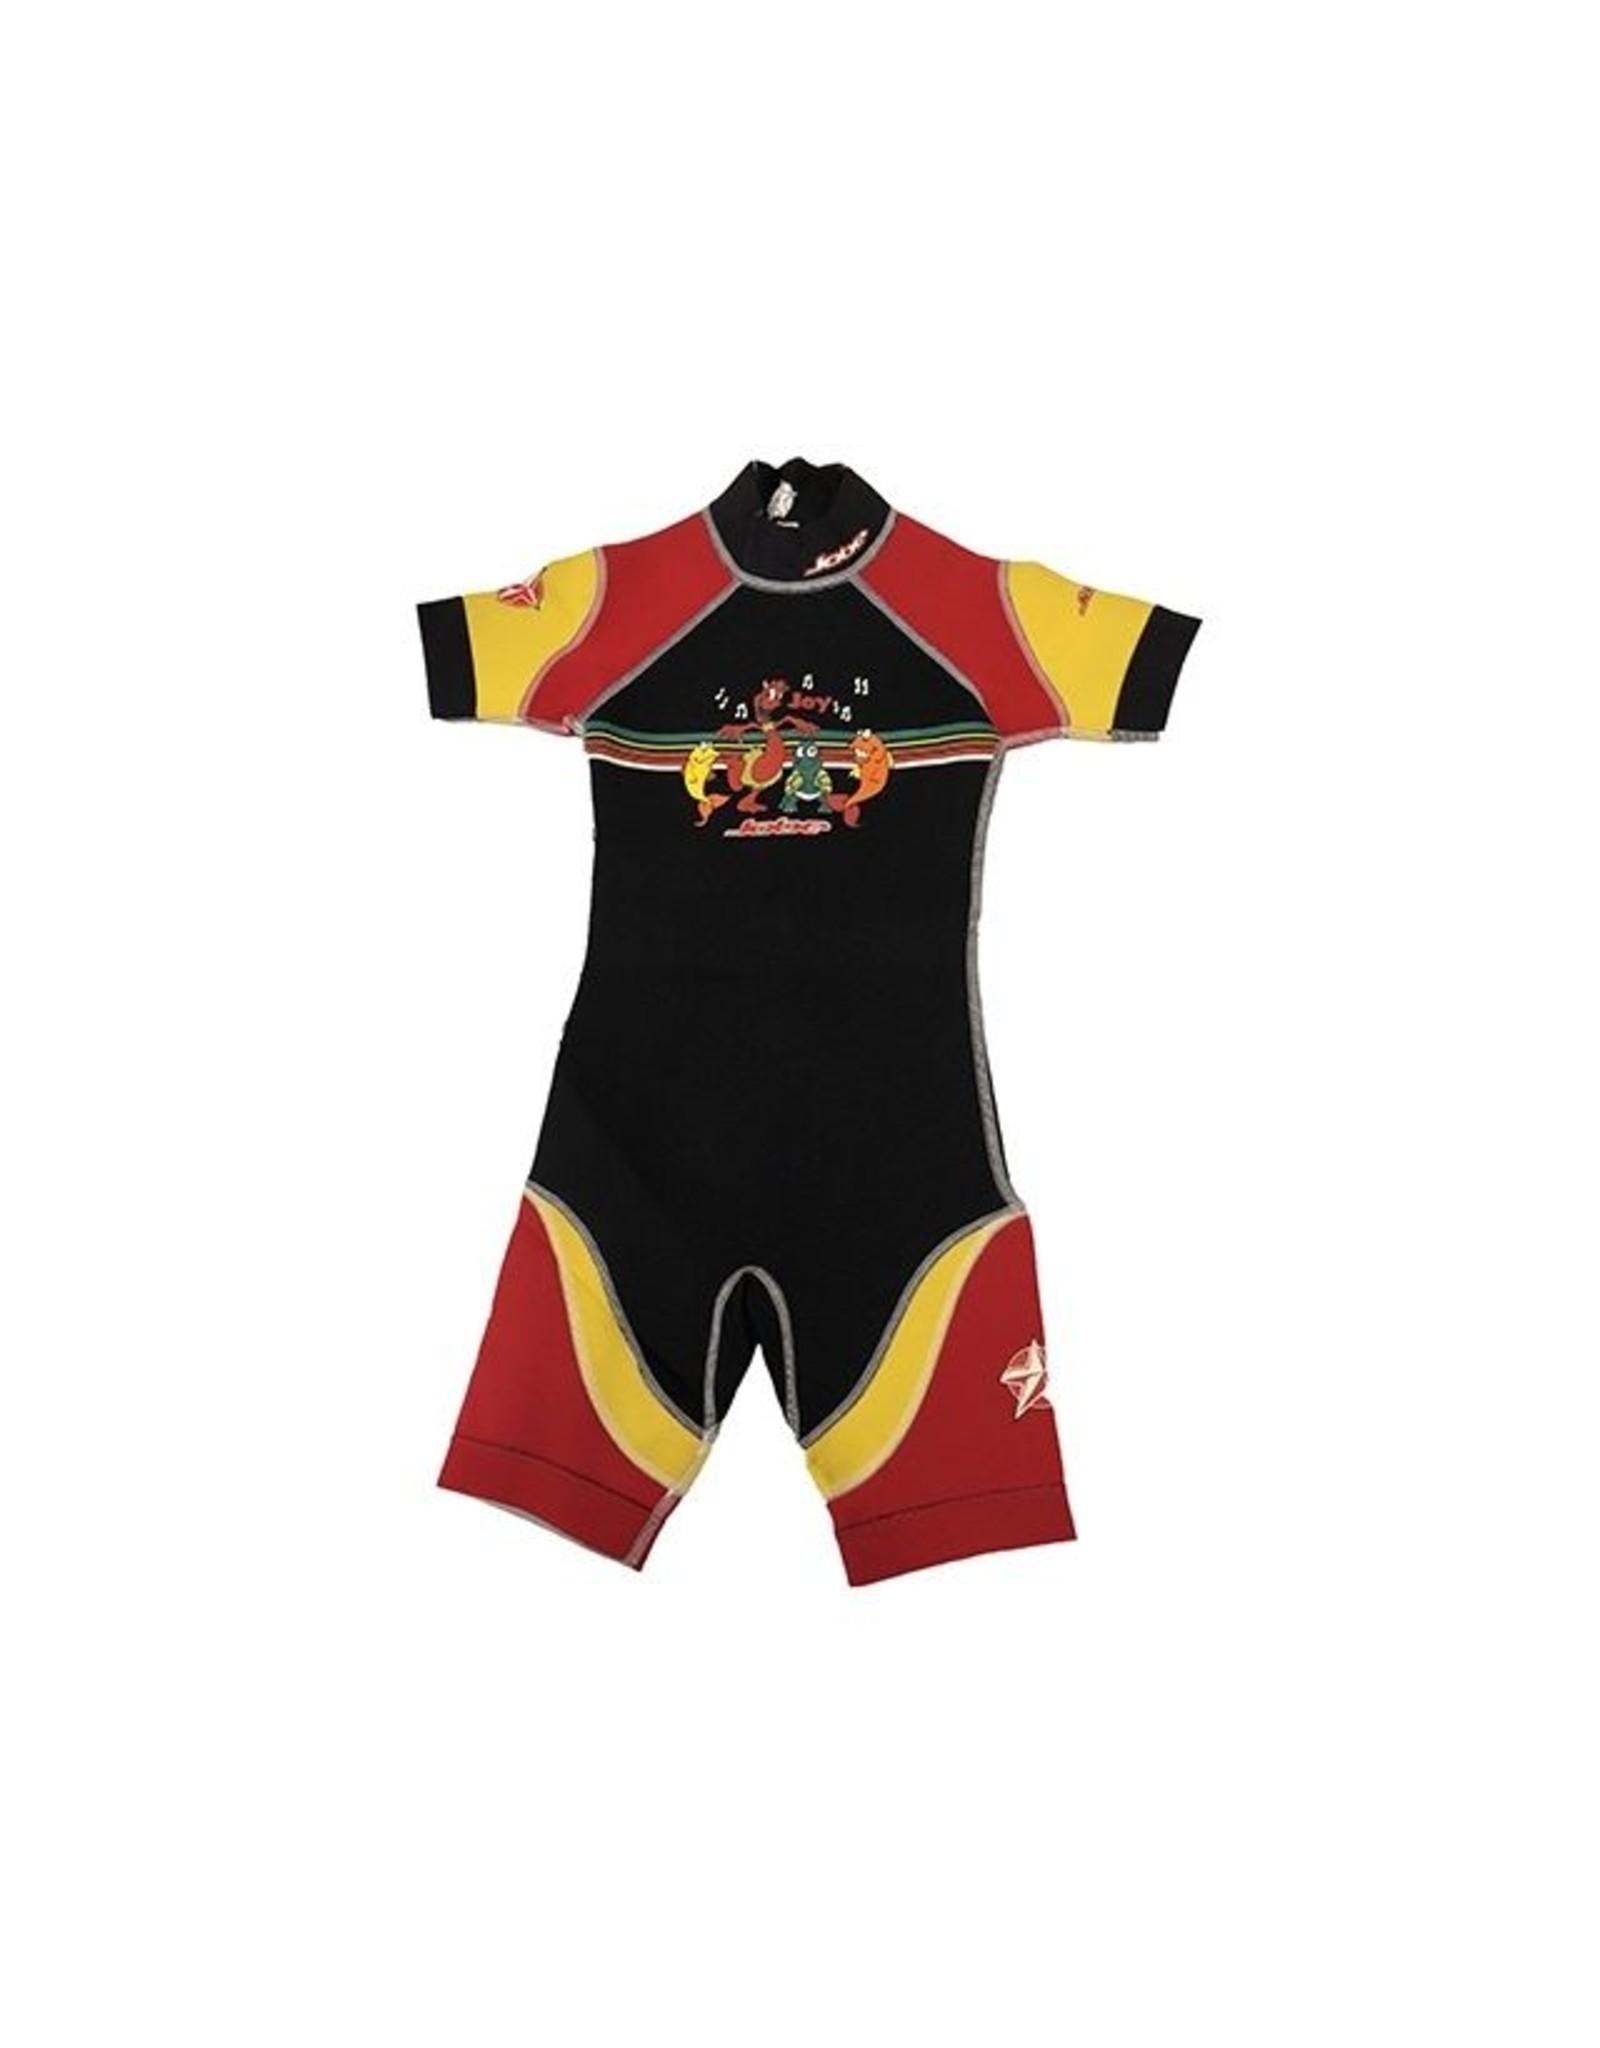 Hebor Watersport Jobe Shorty Joy kinder wetsuit